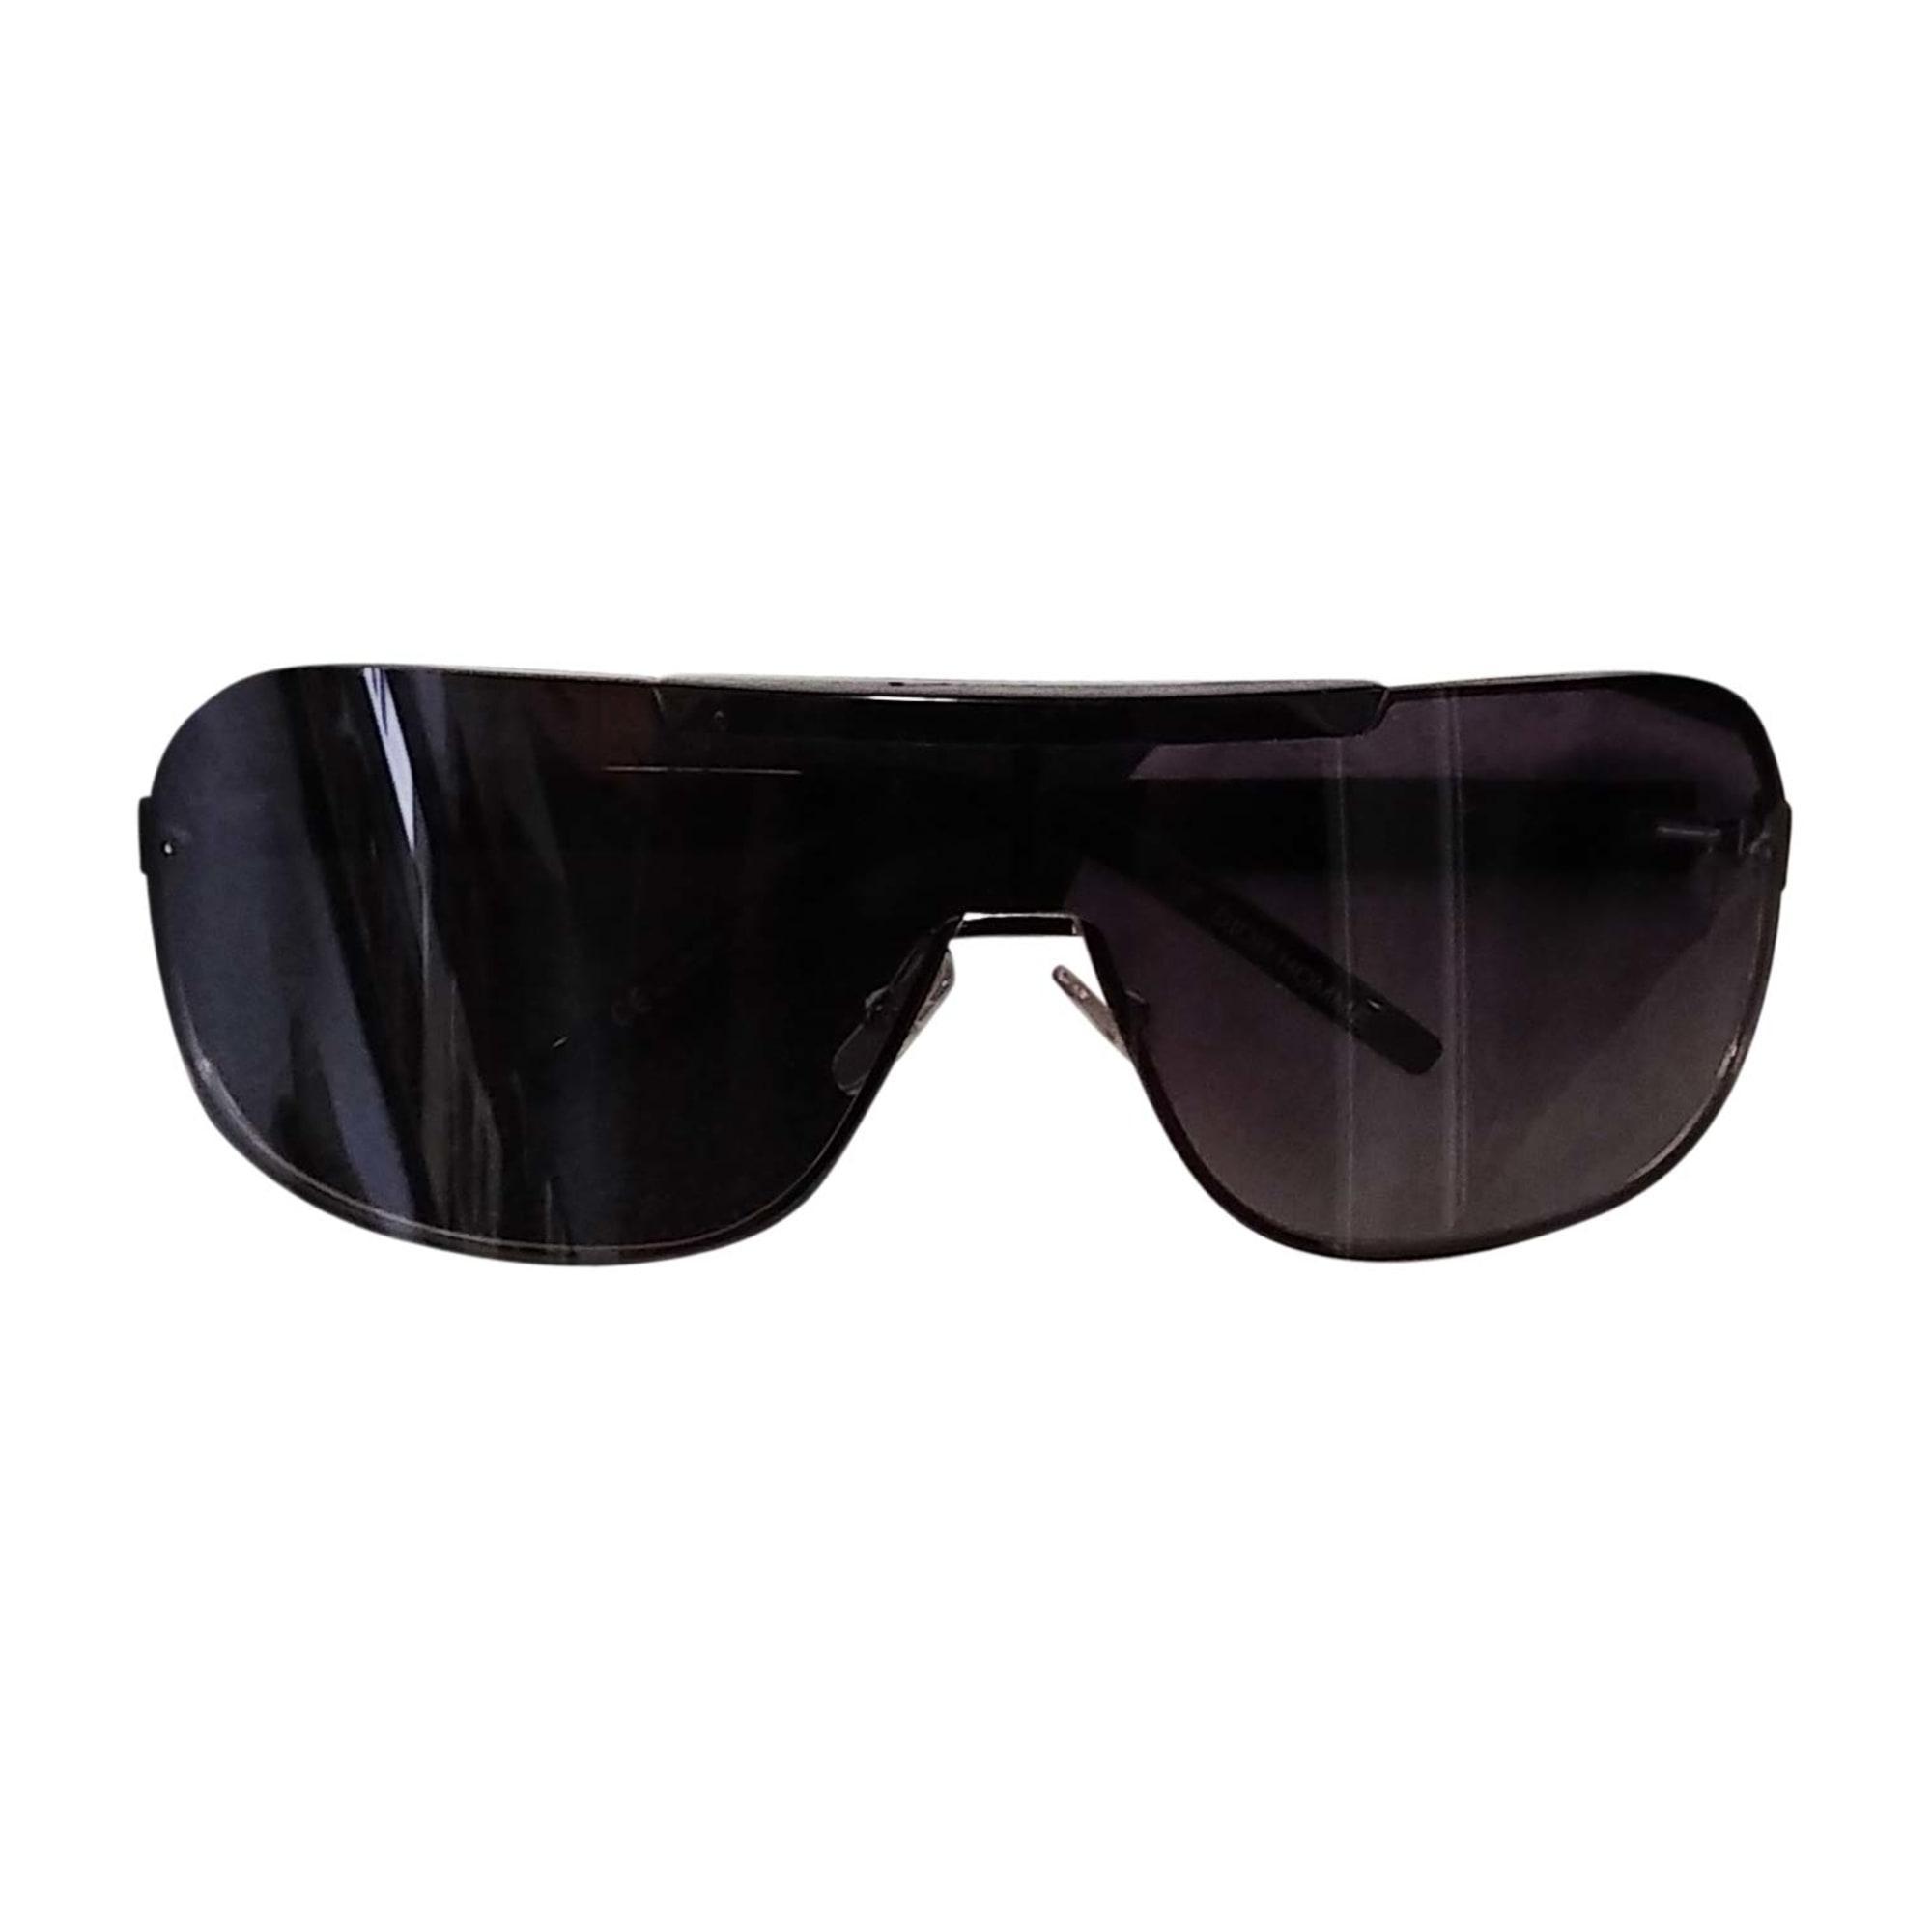 Sonnenbrille DIOR HOMME schwarz vendu par Samuel555 - 7507695